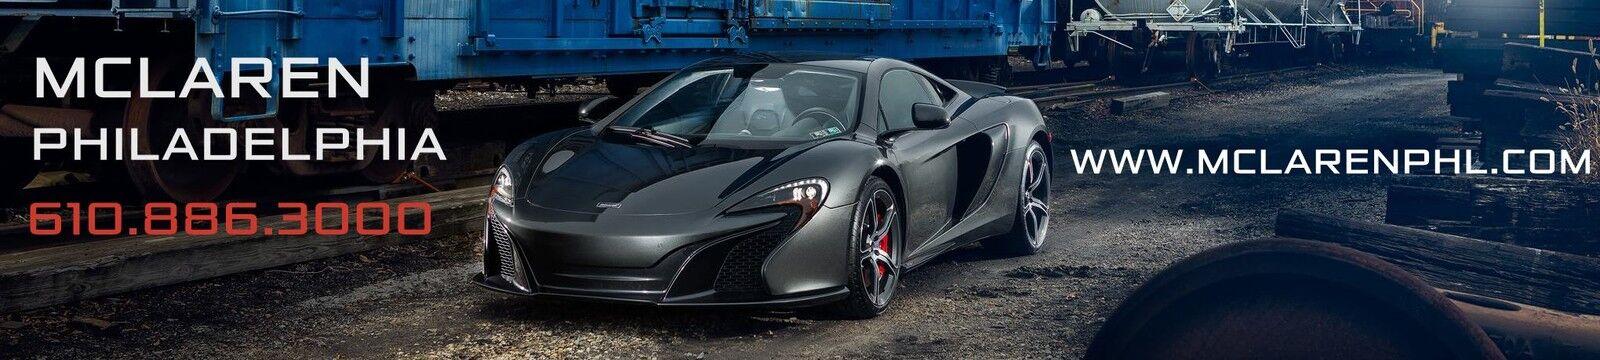 McLaren Philadelphia